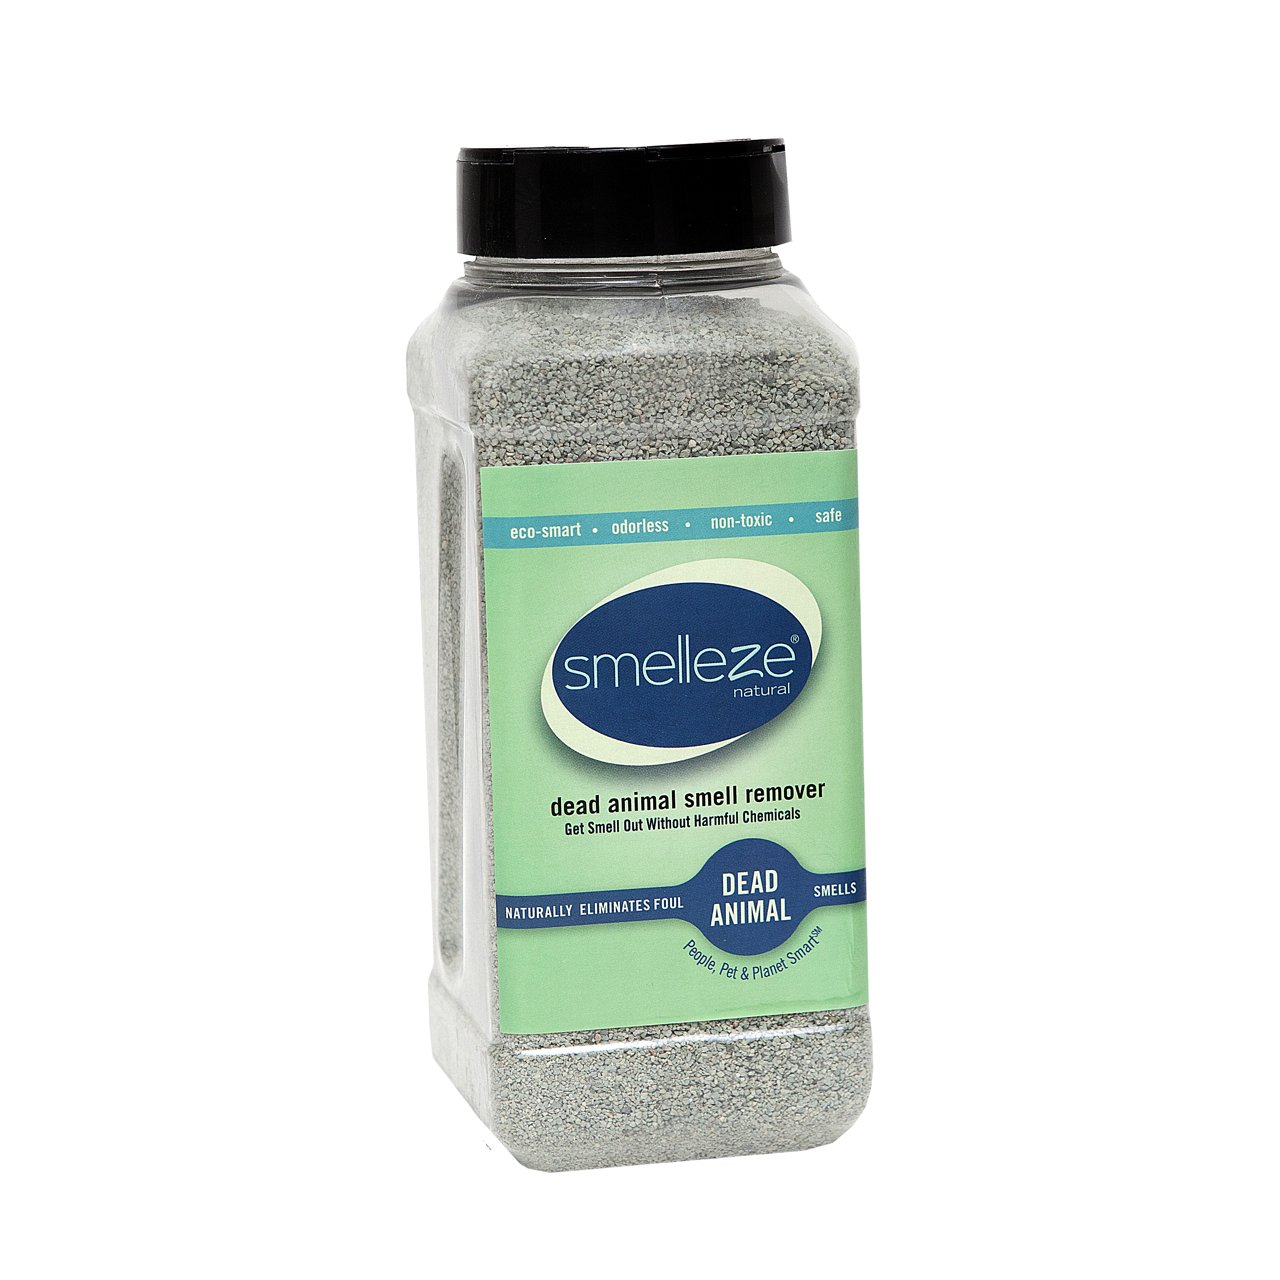 SMELLEZE Eco Yard & Concrete Smell Removal Deodorizer: 50 lb. Granules Rid Outdoor Odor